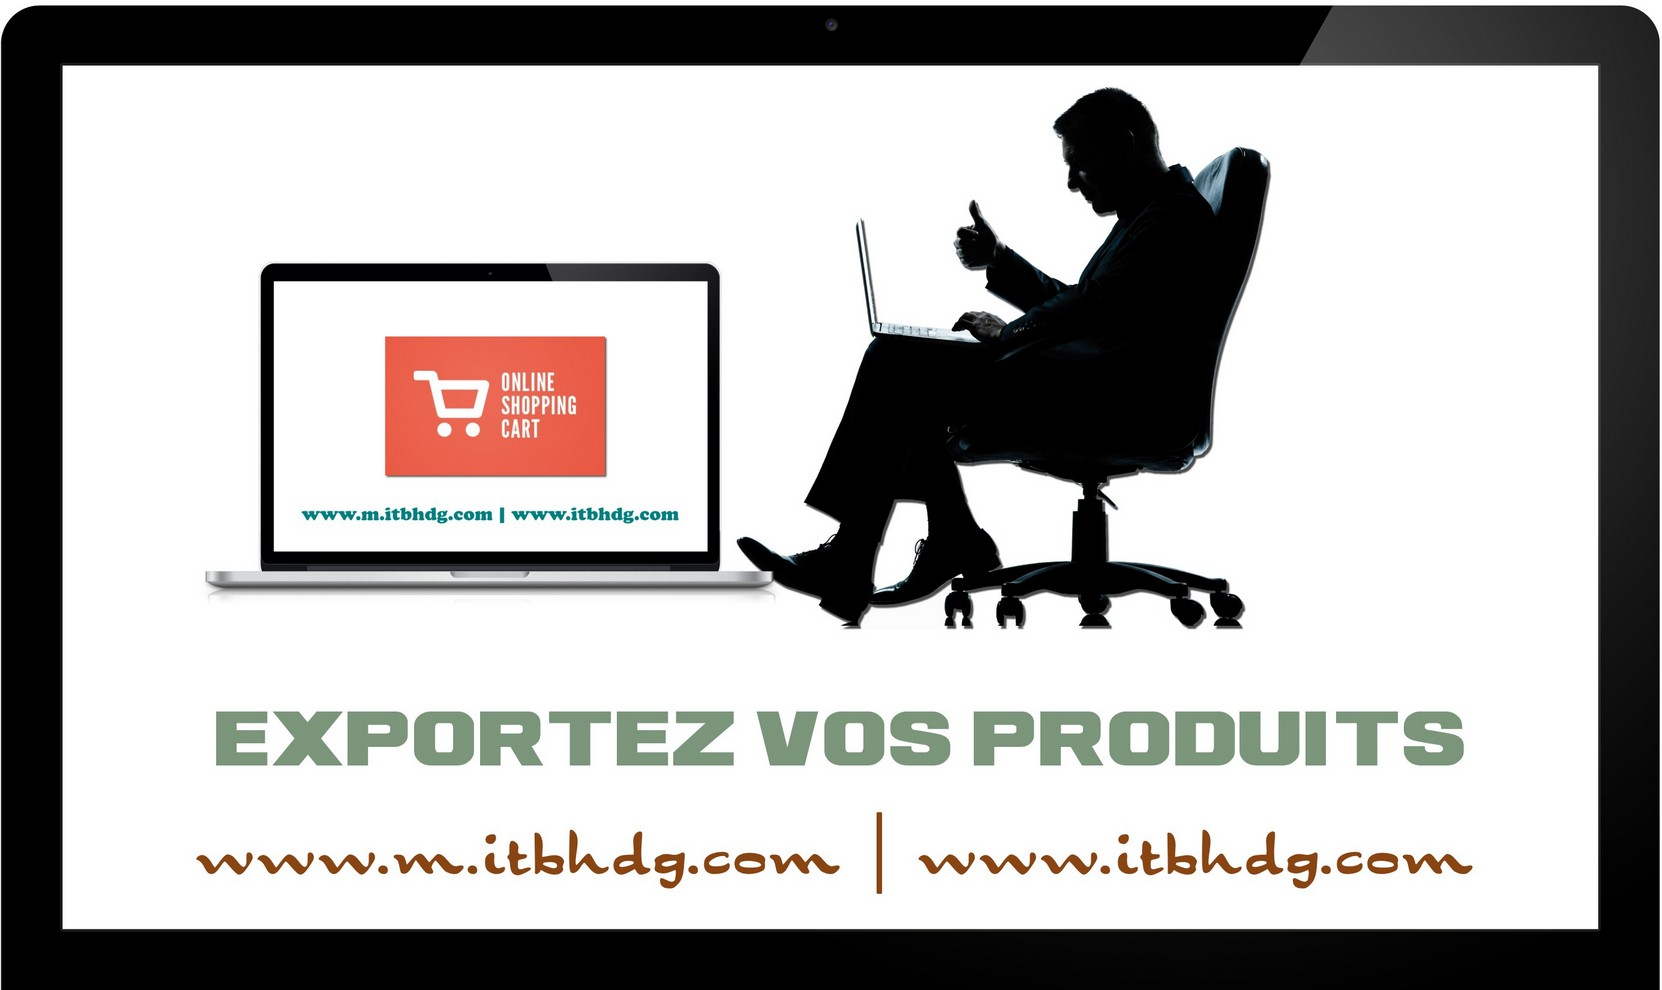 Exporter votre | Boulgour BIO | Seulement 99 USD | Enregistrement FDA | Economisez 75 pourcent @ ITB HOLDINGS LLC | www.m.itbhdg.com | www.itbhdg.com | http://www.itbhdg.com/french/contact.php